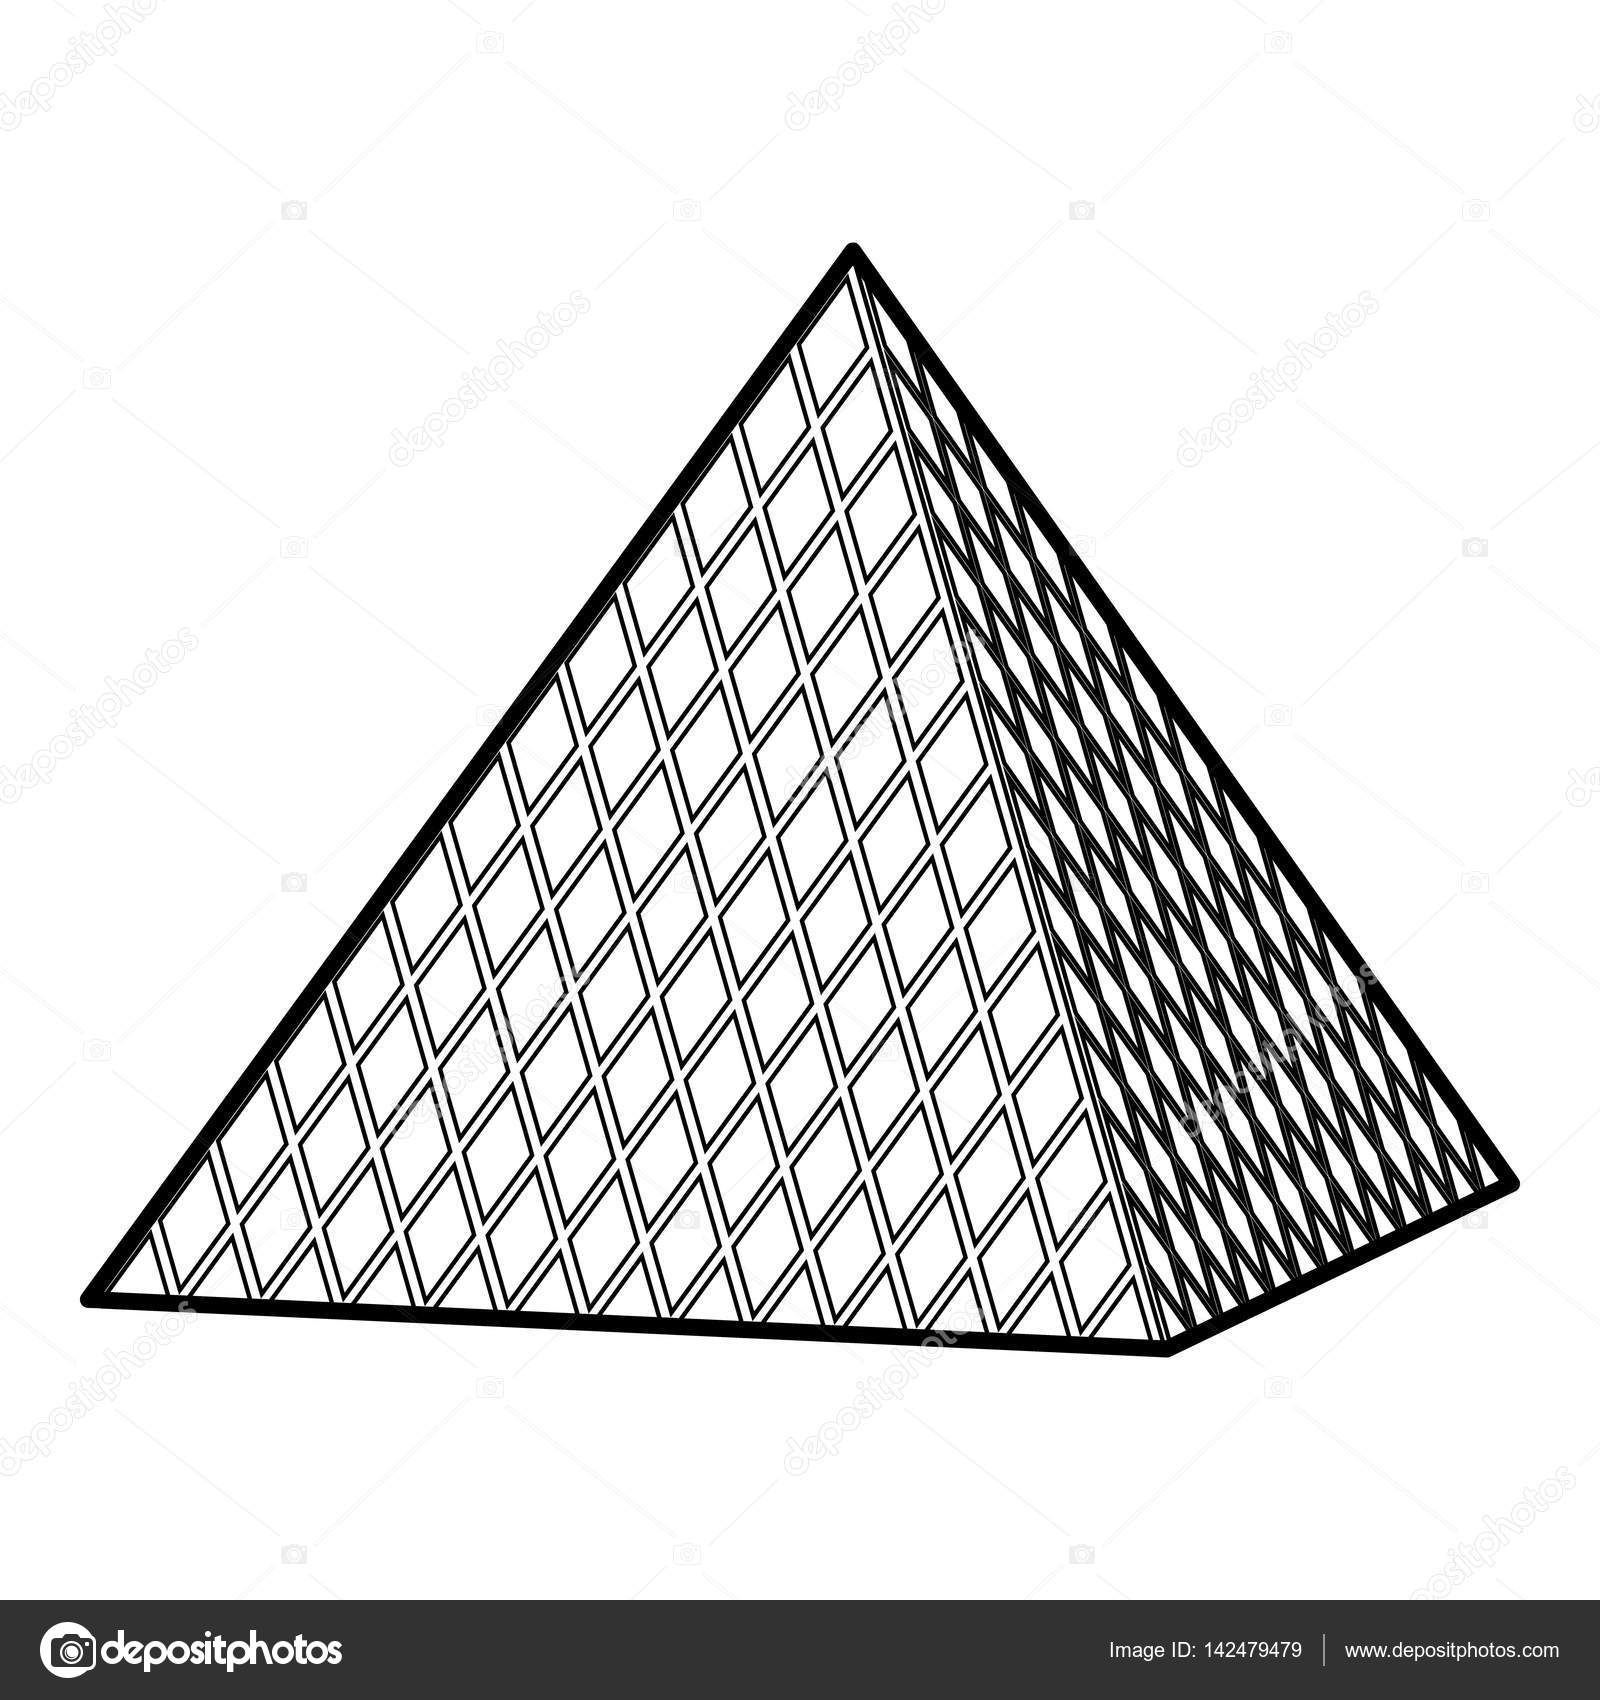 Louvre pyramida ikona styl osnovy stock vektor - Dessin de pyramide ...